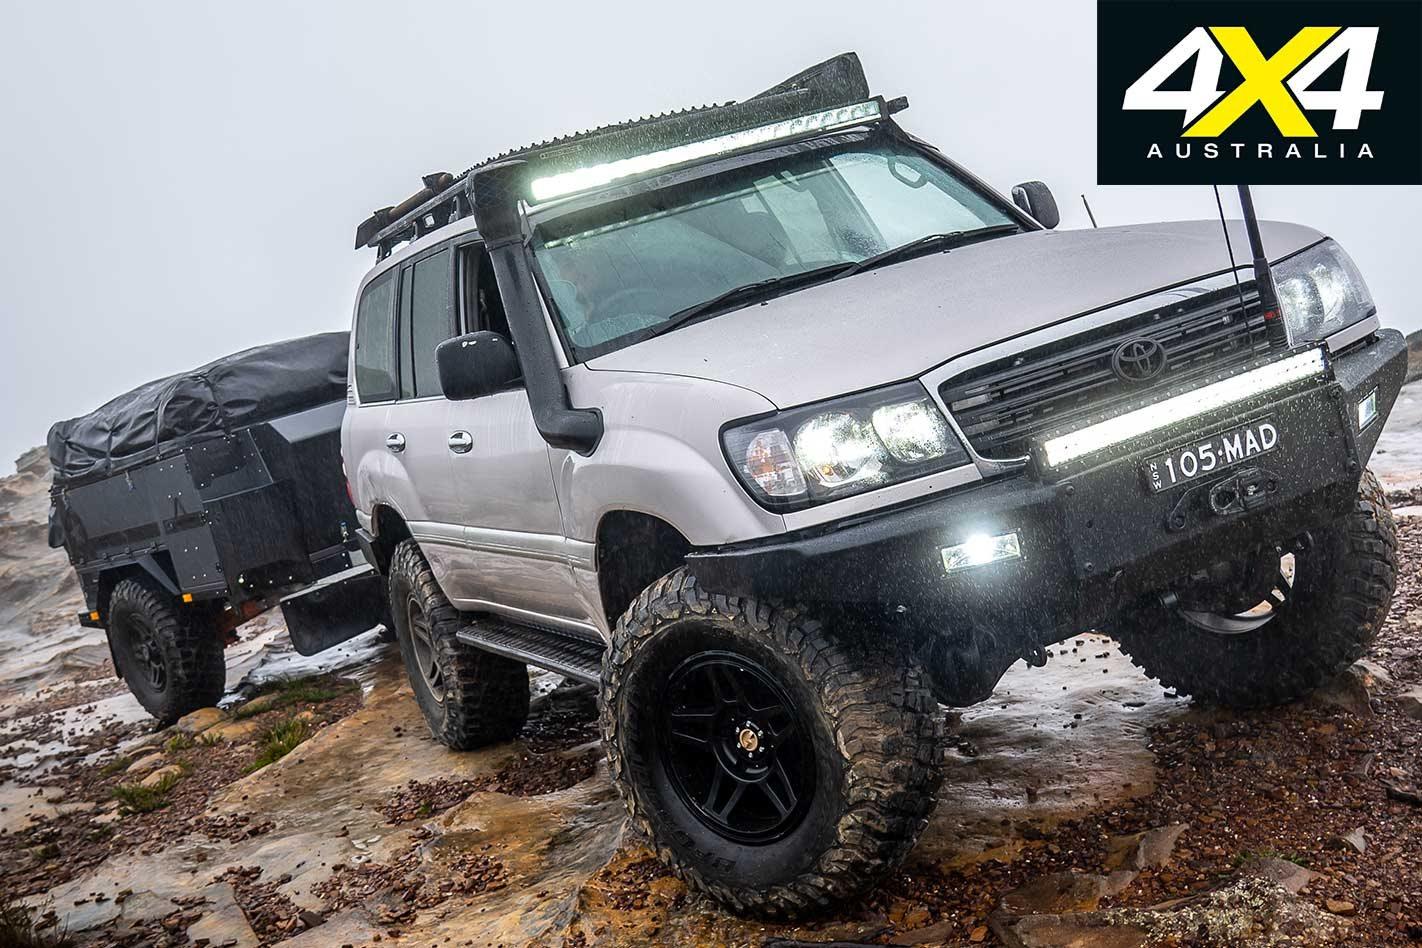 Kelebihan Kekurangan Toyota Land Cruiser 105 Harga